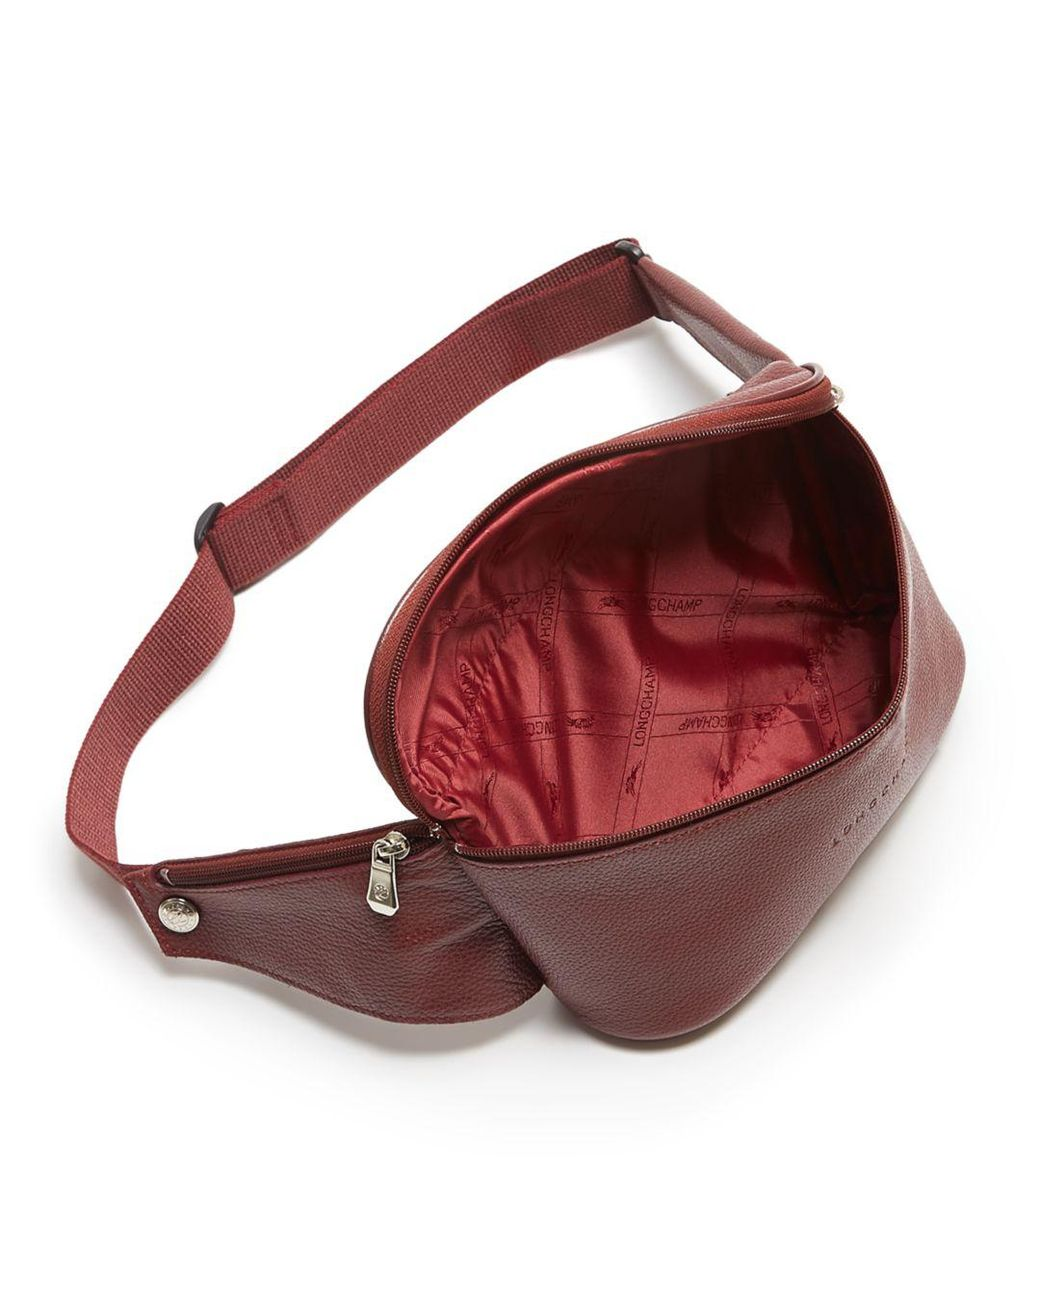 Longchamp Le Foulonné Leather Belt Bag in Black/Nickel Black ...